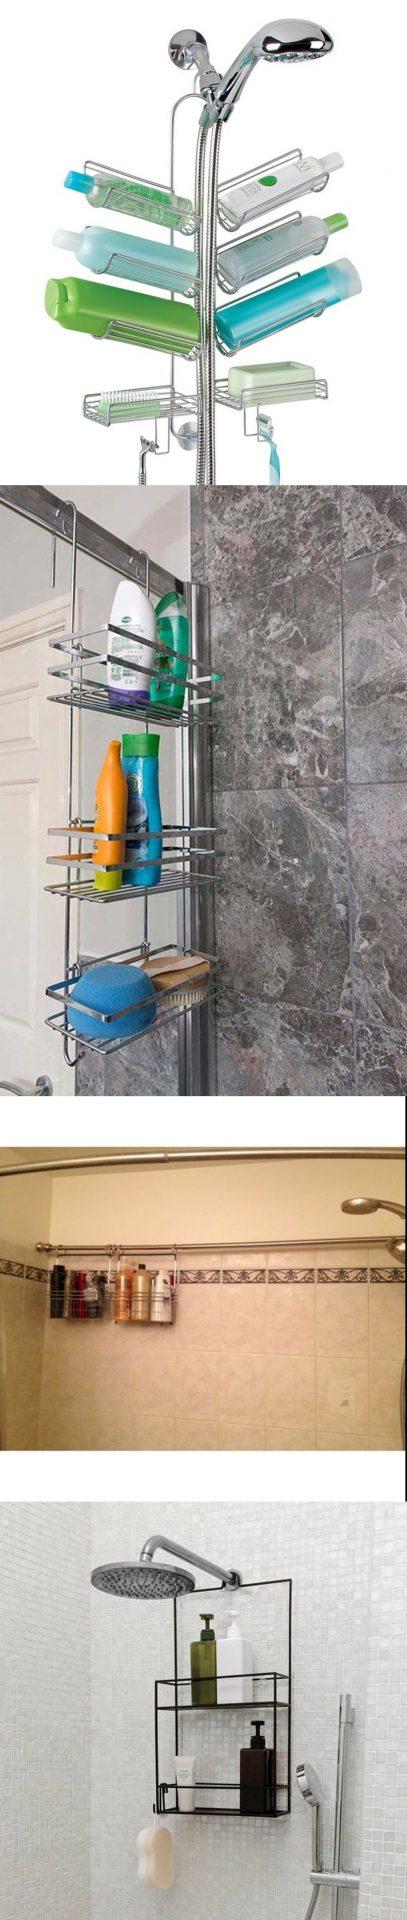 rv bathroom kit